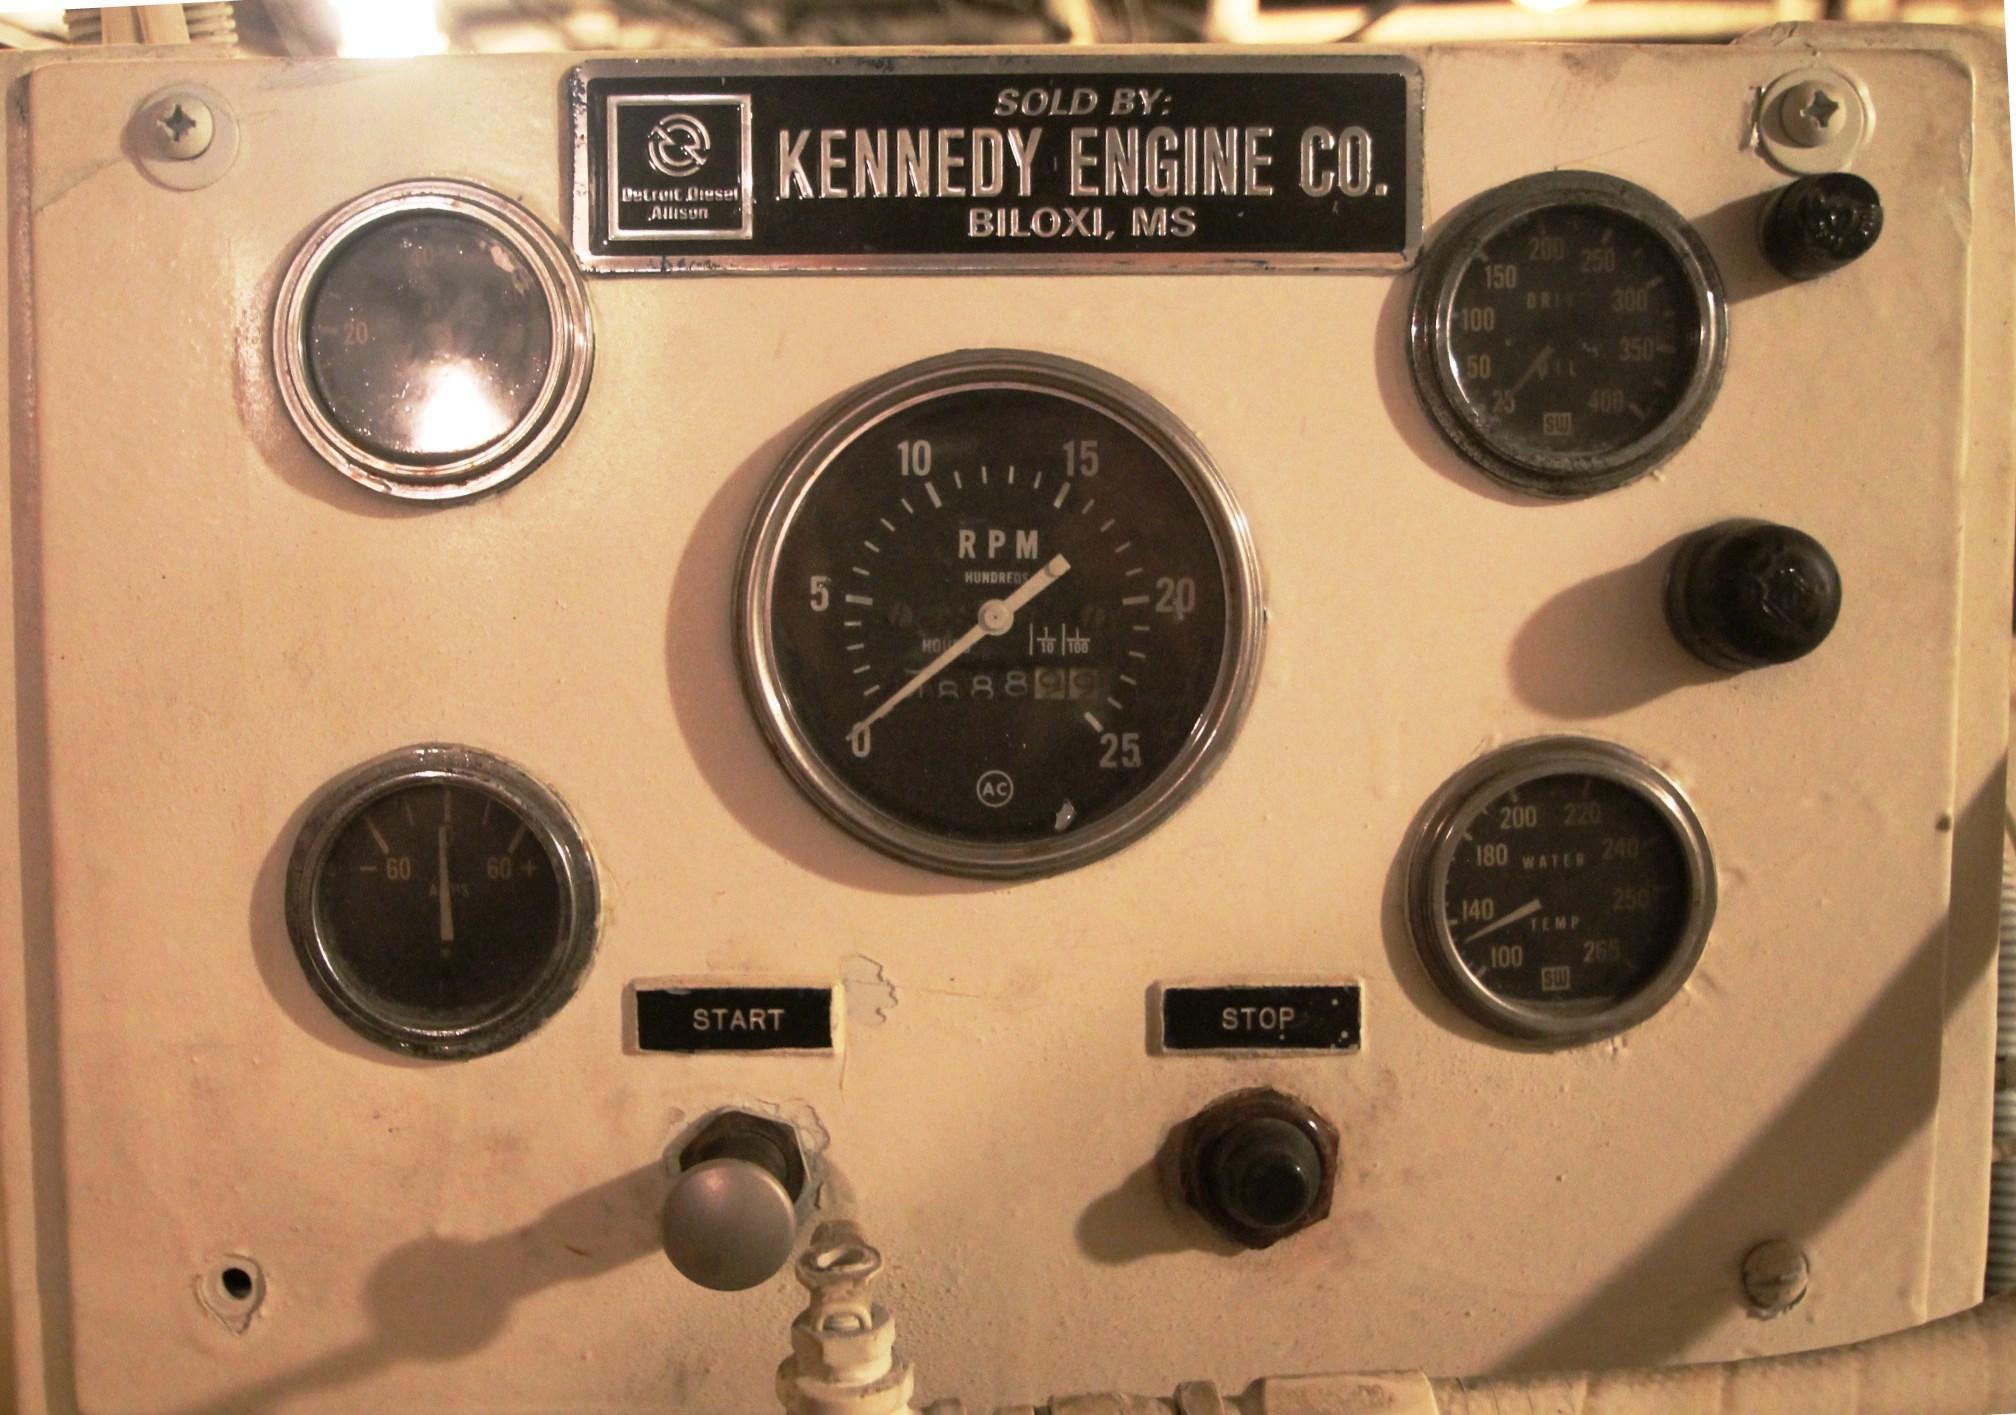 Stbd Engine Panel